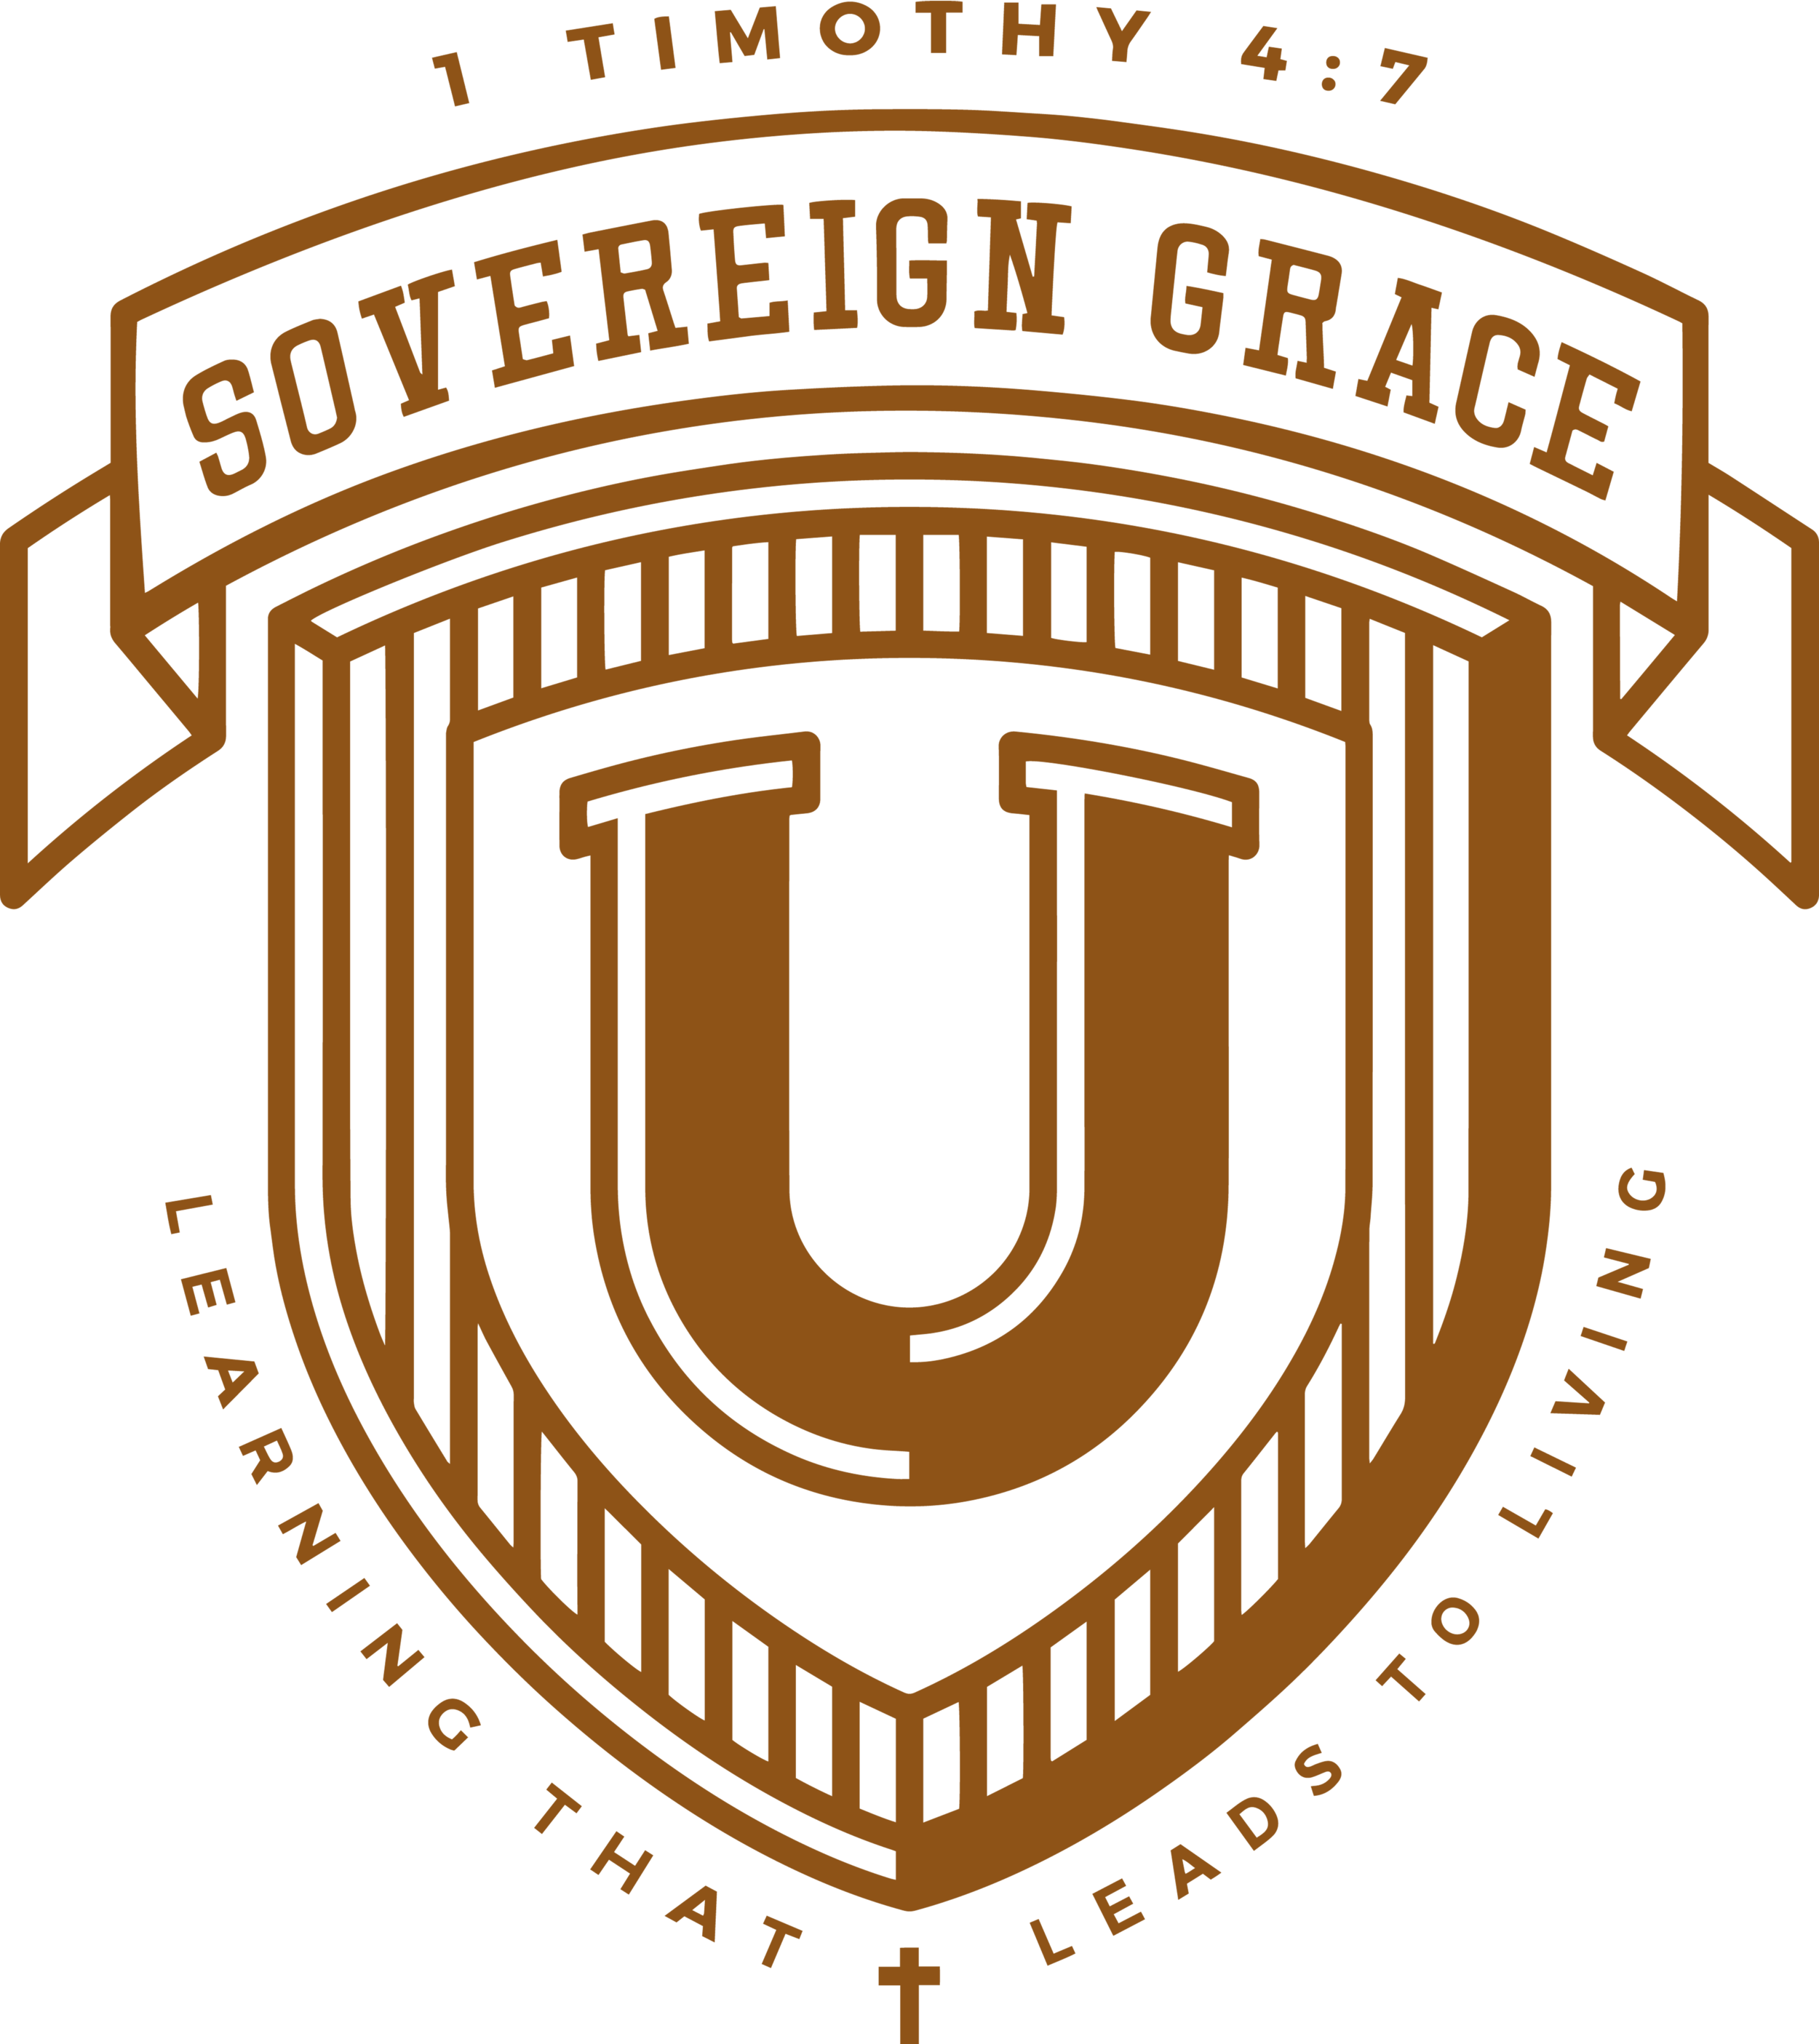 Sovereign Grace U copper.png